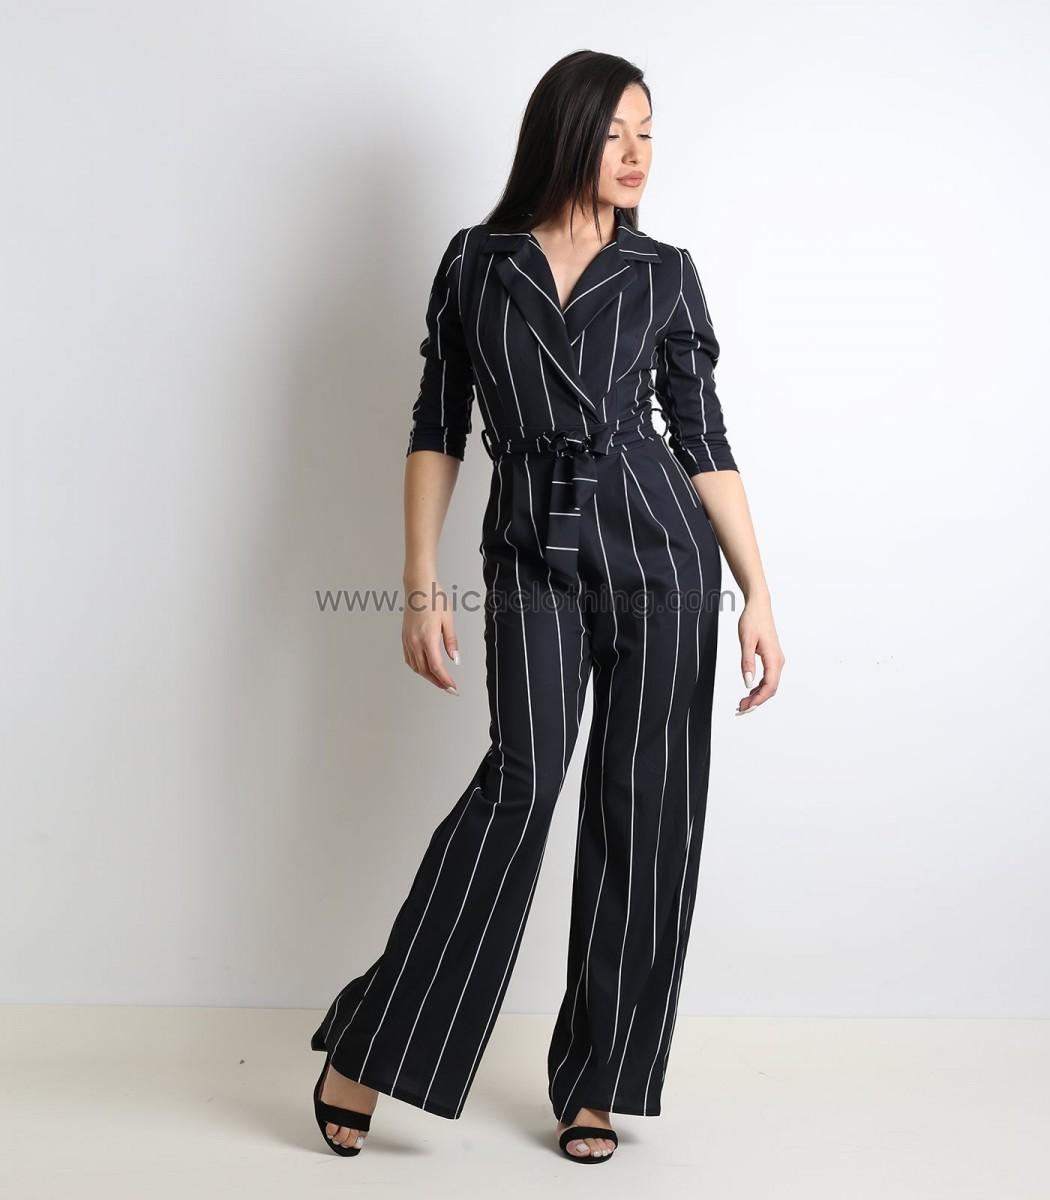 906420e20a1 Γυναικεία ολόσωμη φόρμα ριγέ με γιακά και ζώνη (Μαύρο)